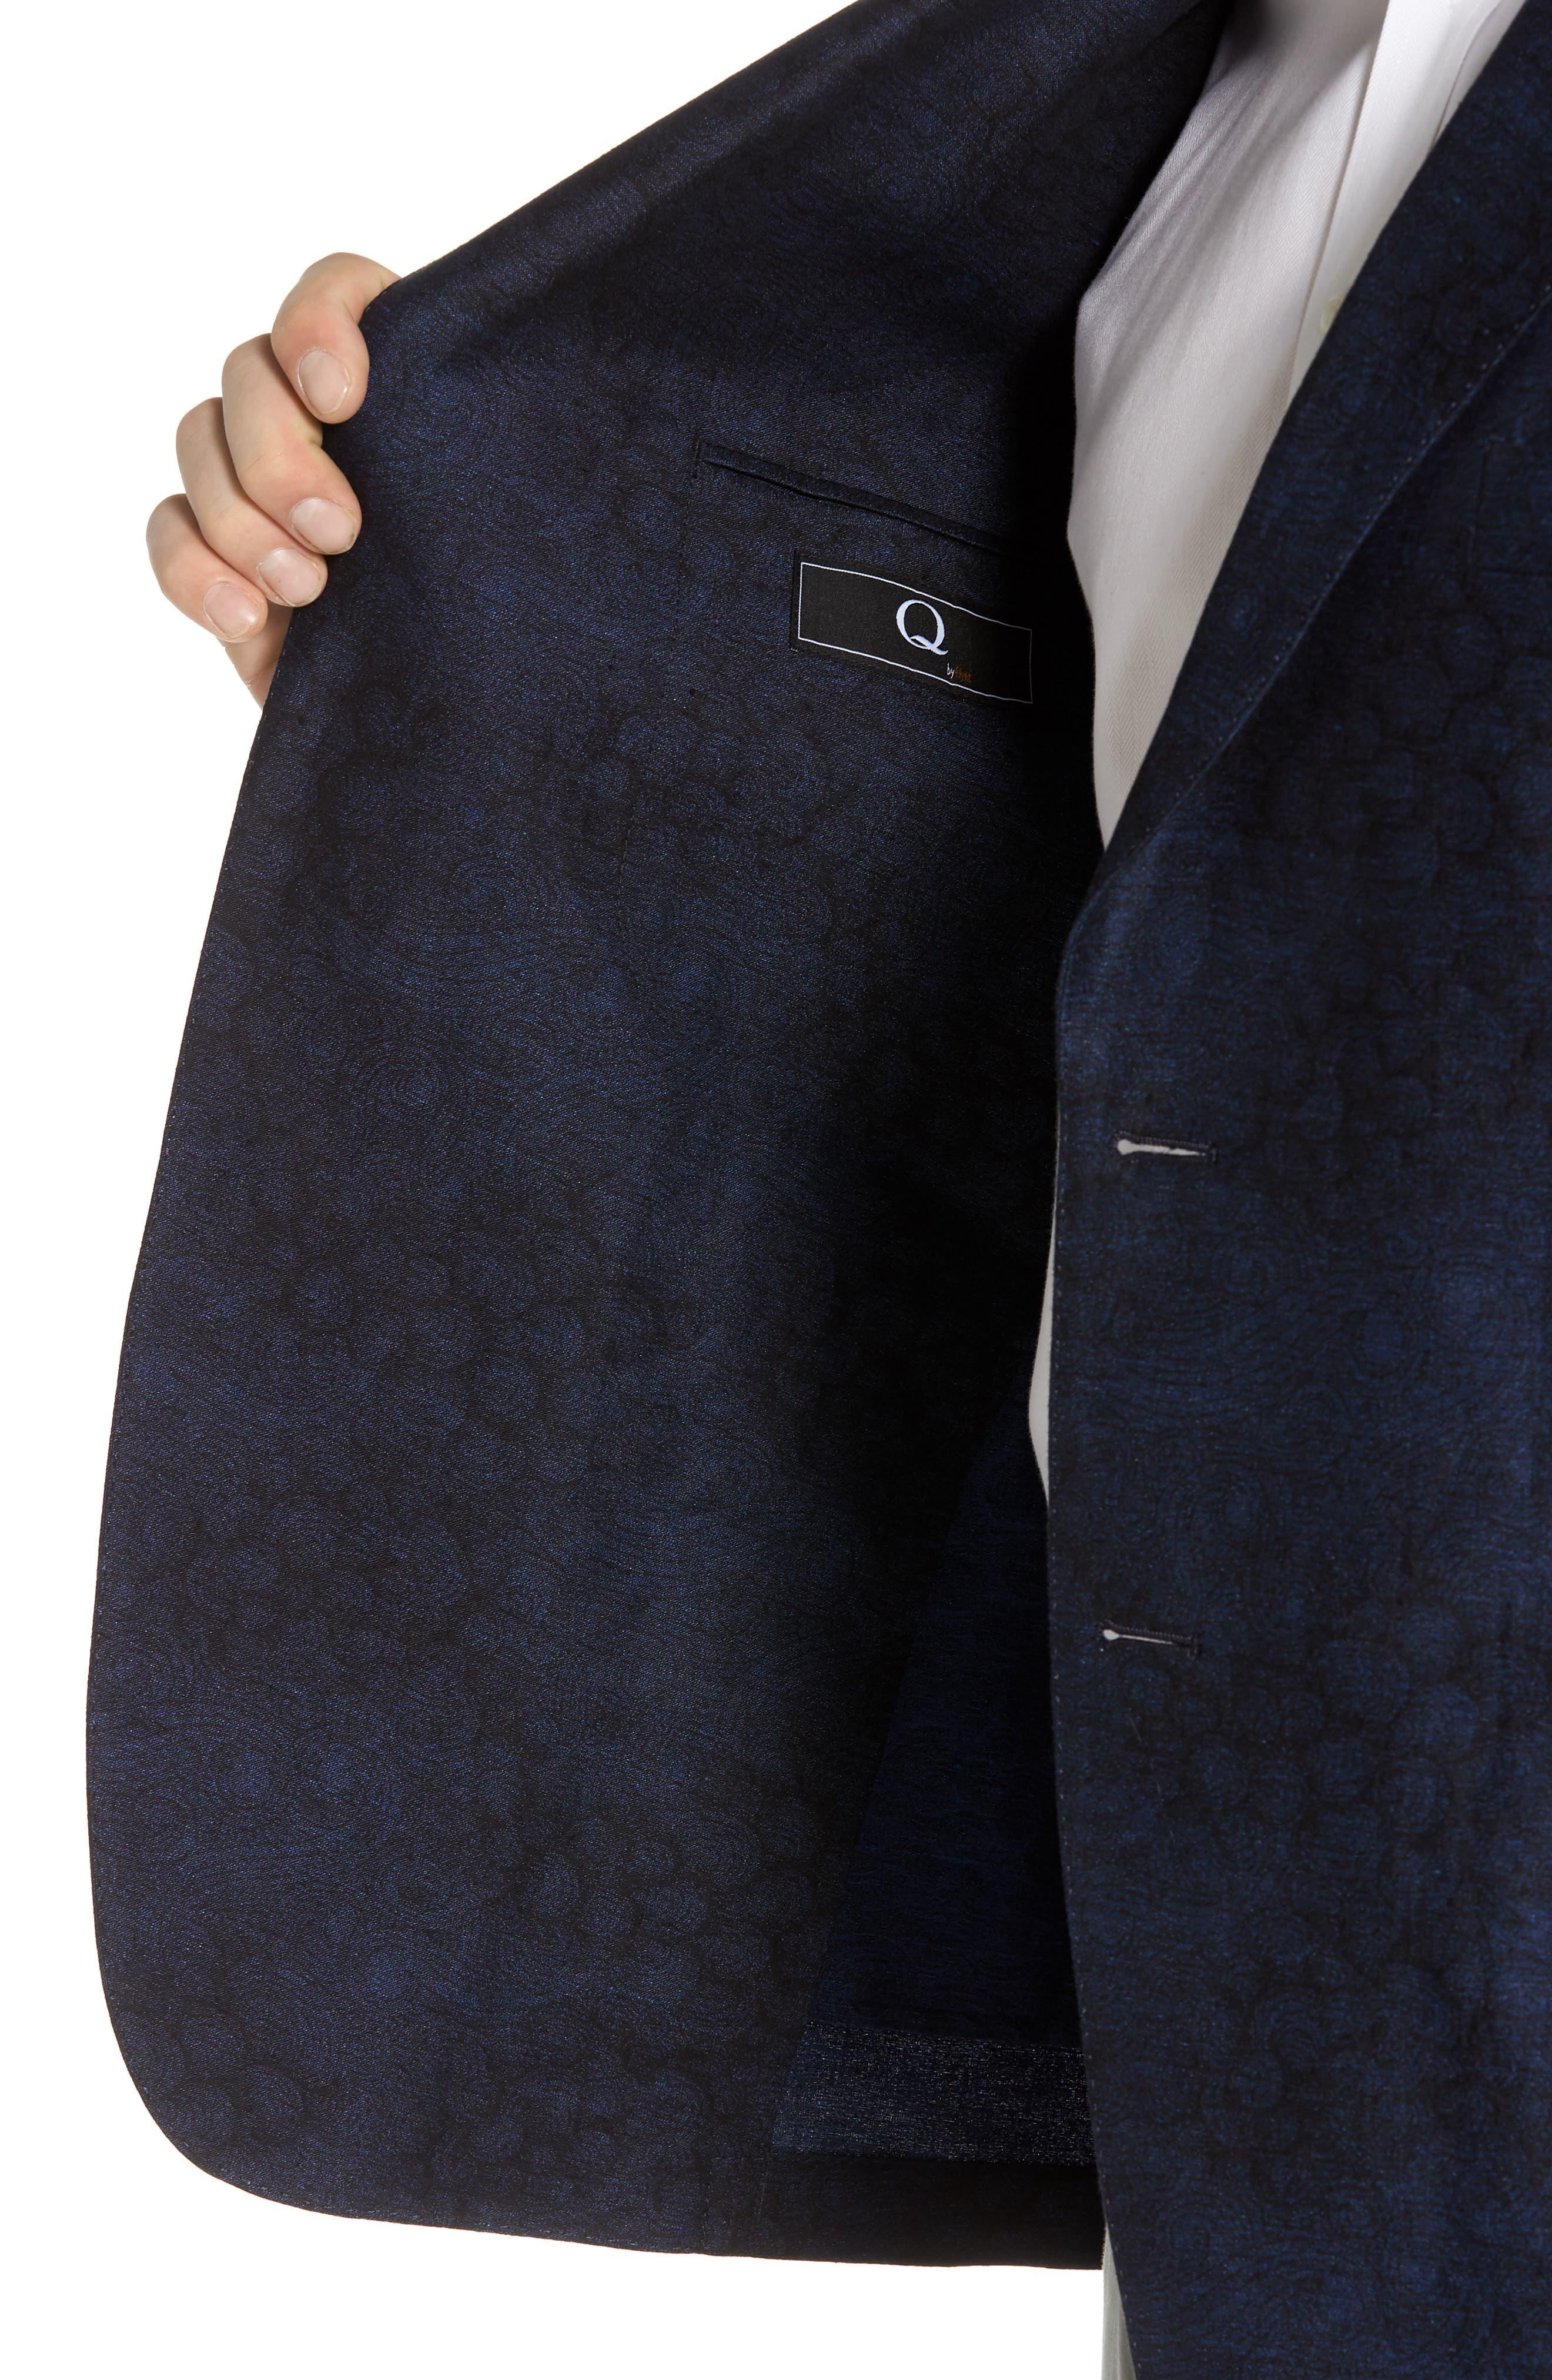 Slim Fit Patterned Linen Blend Sport Coat,                             Alternate thumbnail 4, color,                             Indigo Blue